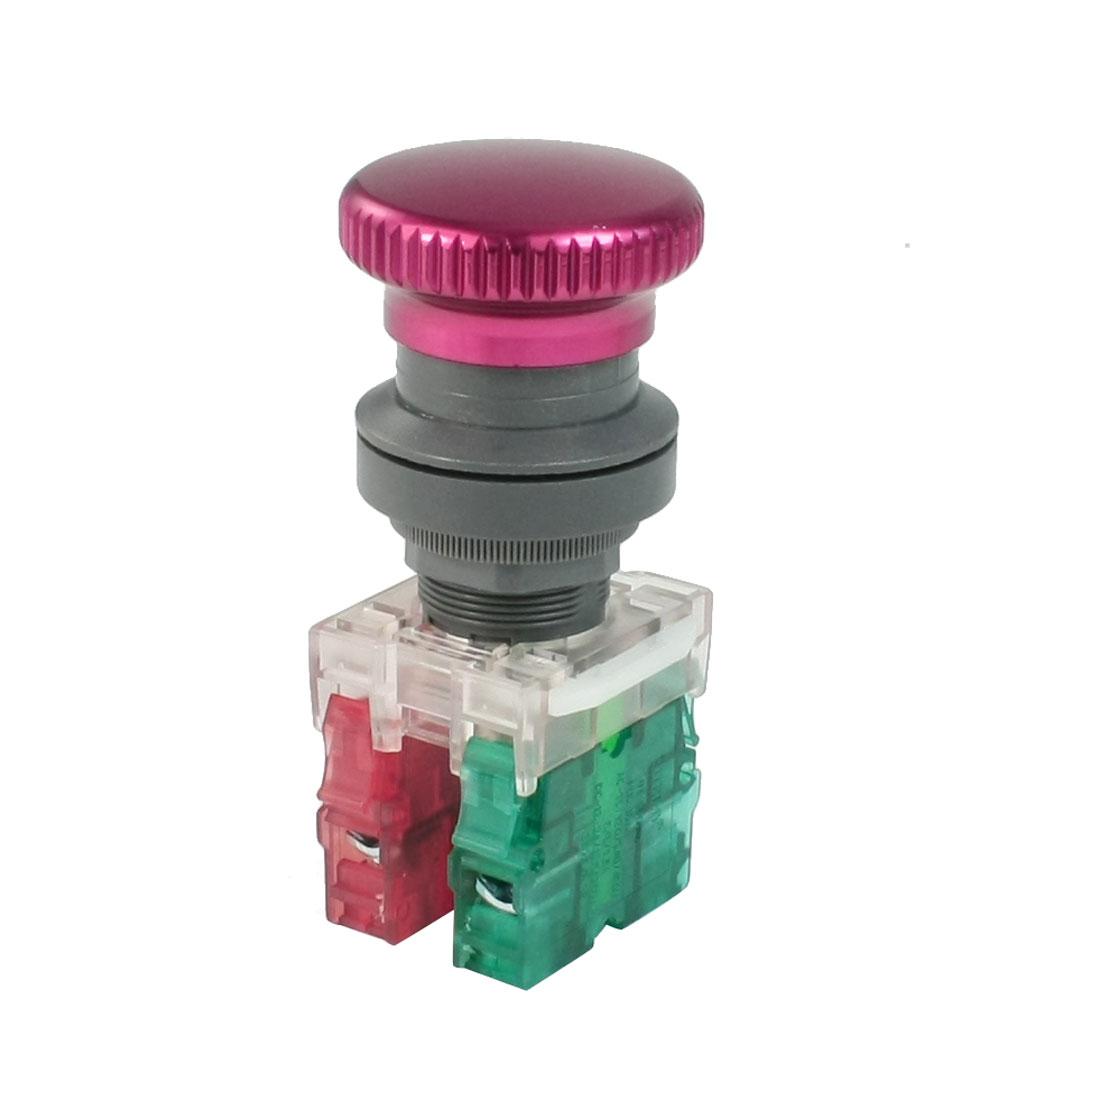 AC600V Ui 10A Ith 1NO 1NC Burgundy Mushroom Cap Momentary Push Button Switch